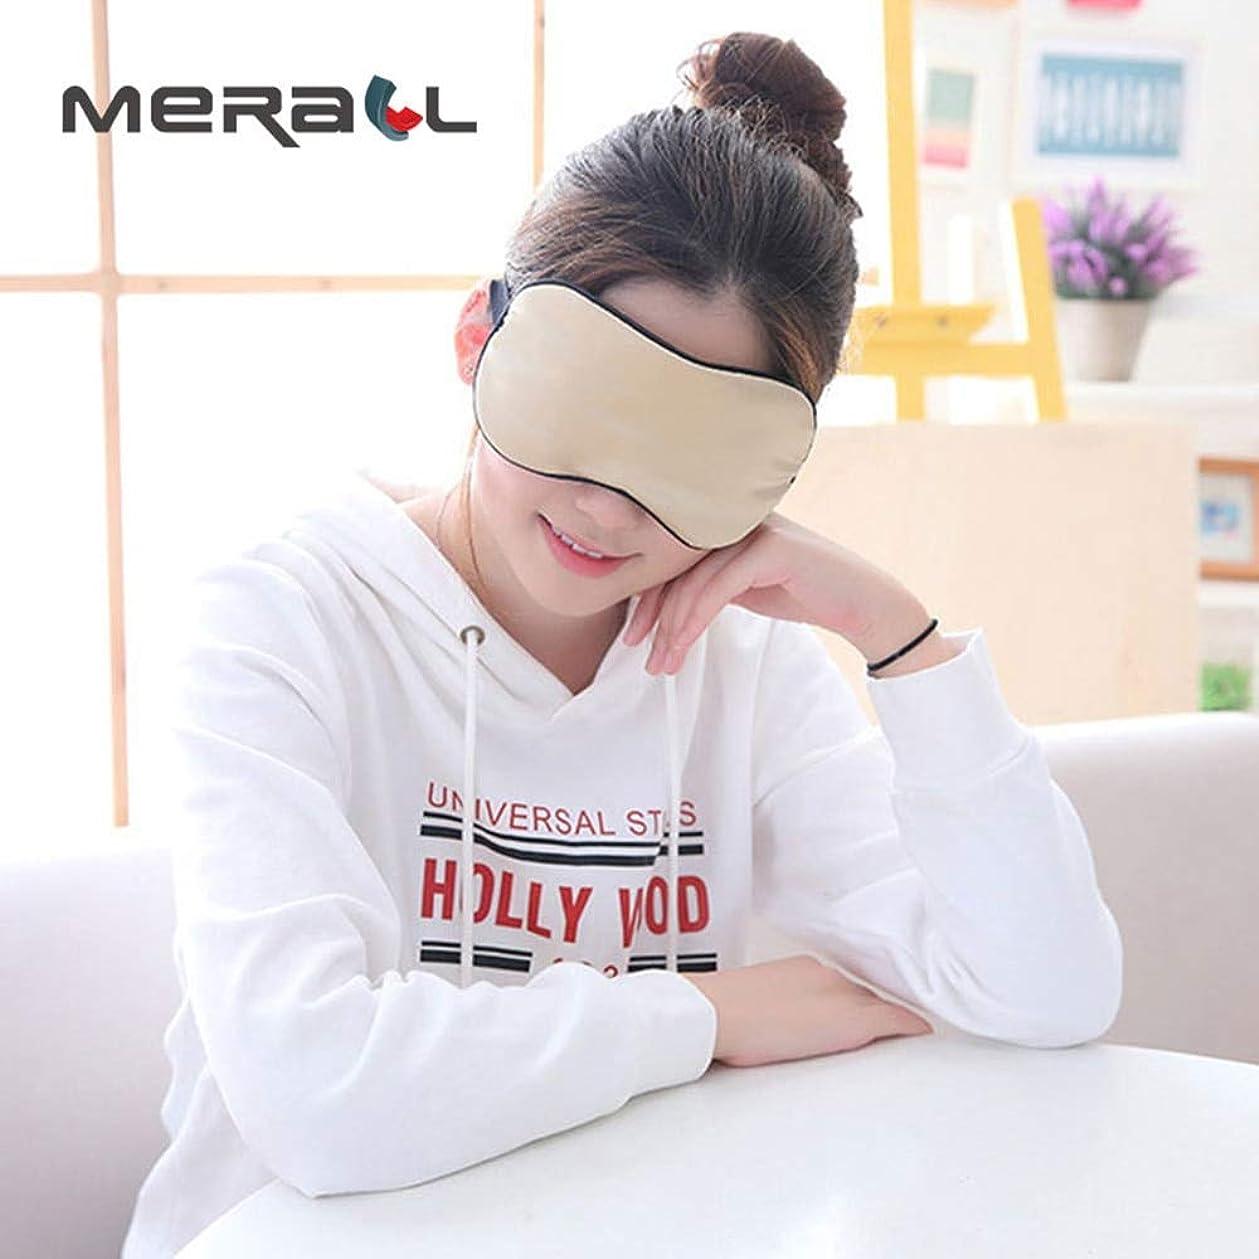 NOTE 通気性睡眠アイマスク調節可能な両面模造本物のシルクコットンライトシェードブラック目隠し睡眠ケアエイドツール1ピース